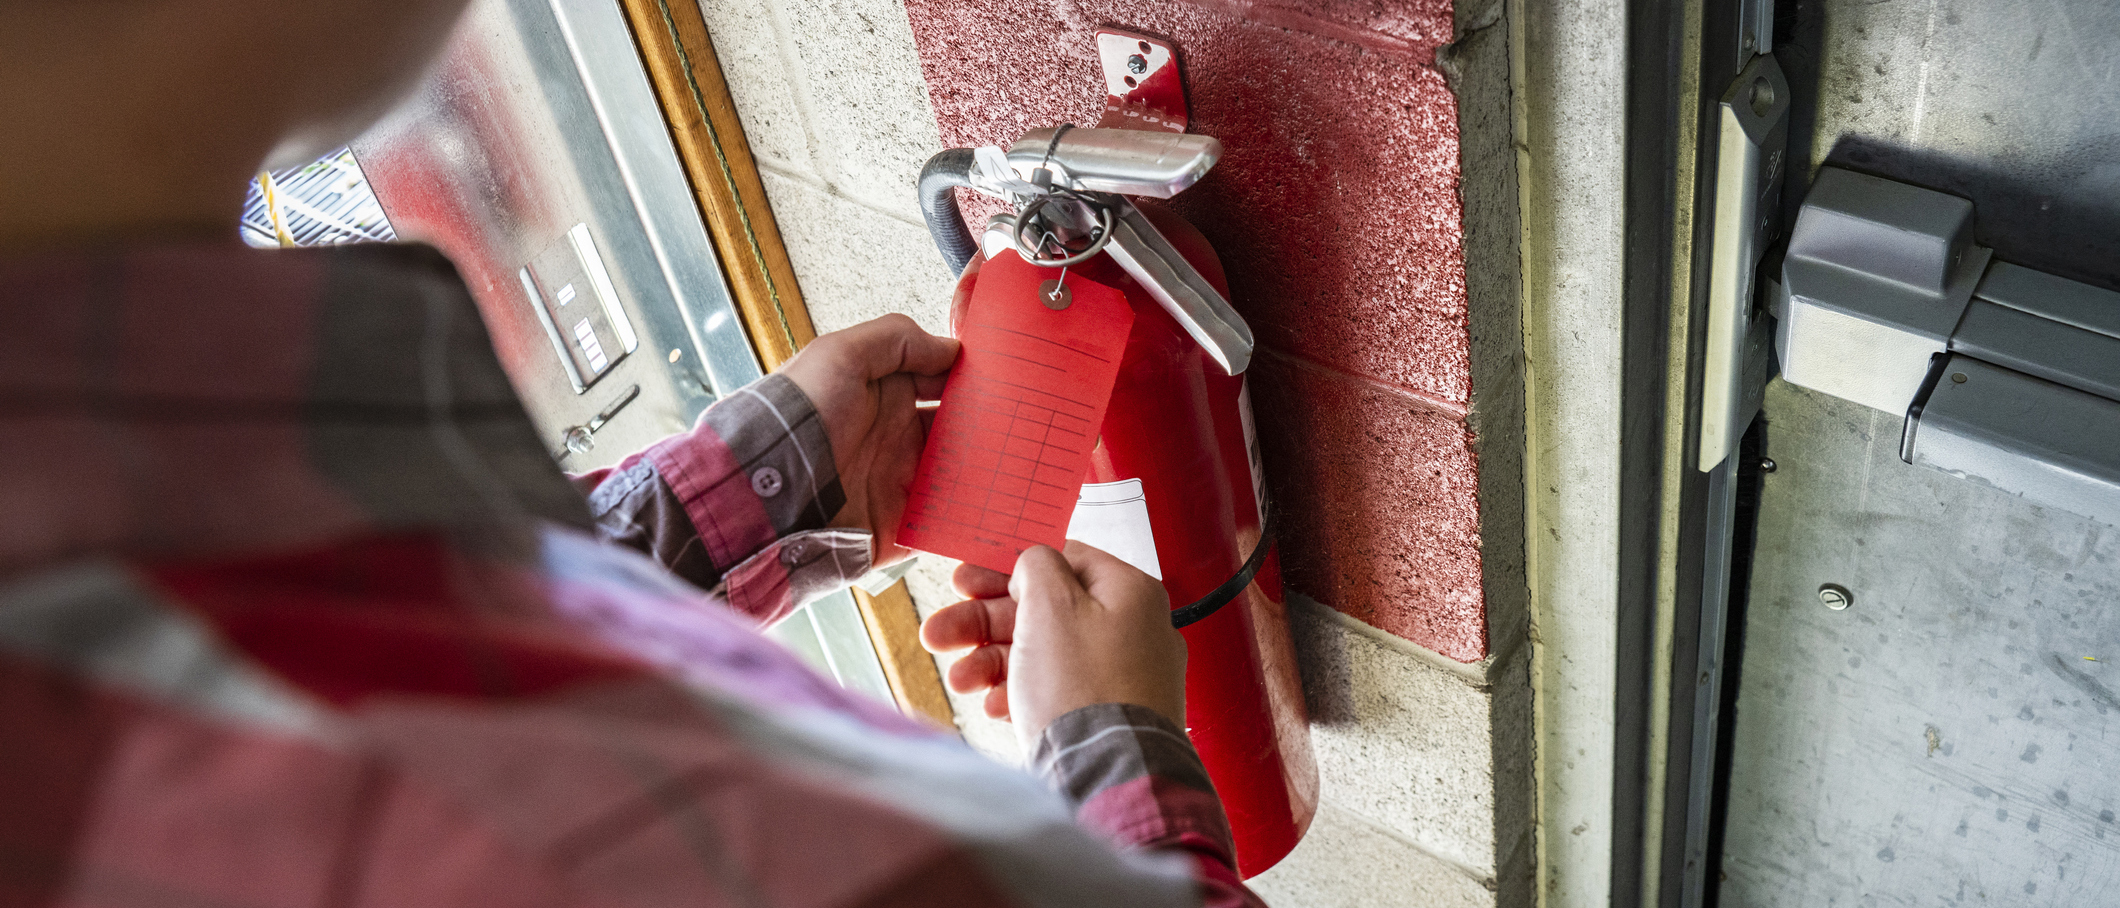 A person checks a fire extinguisher.